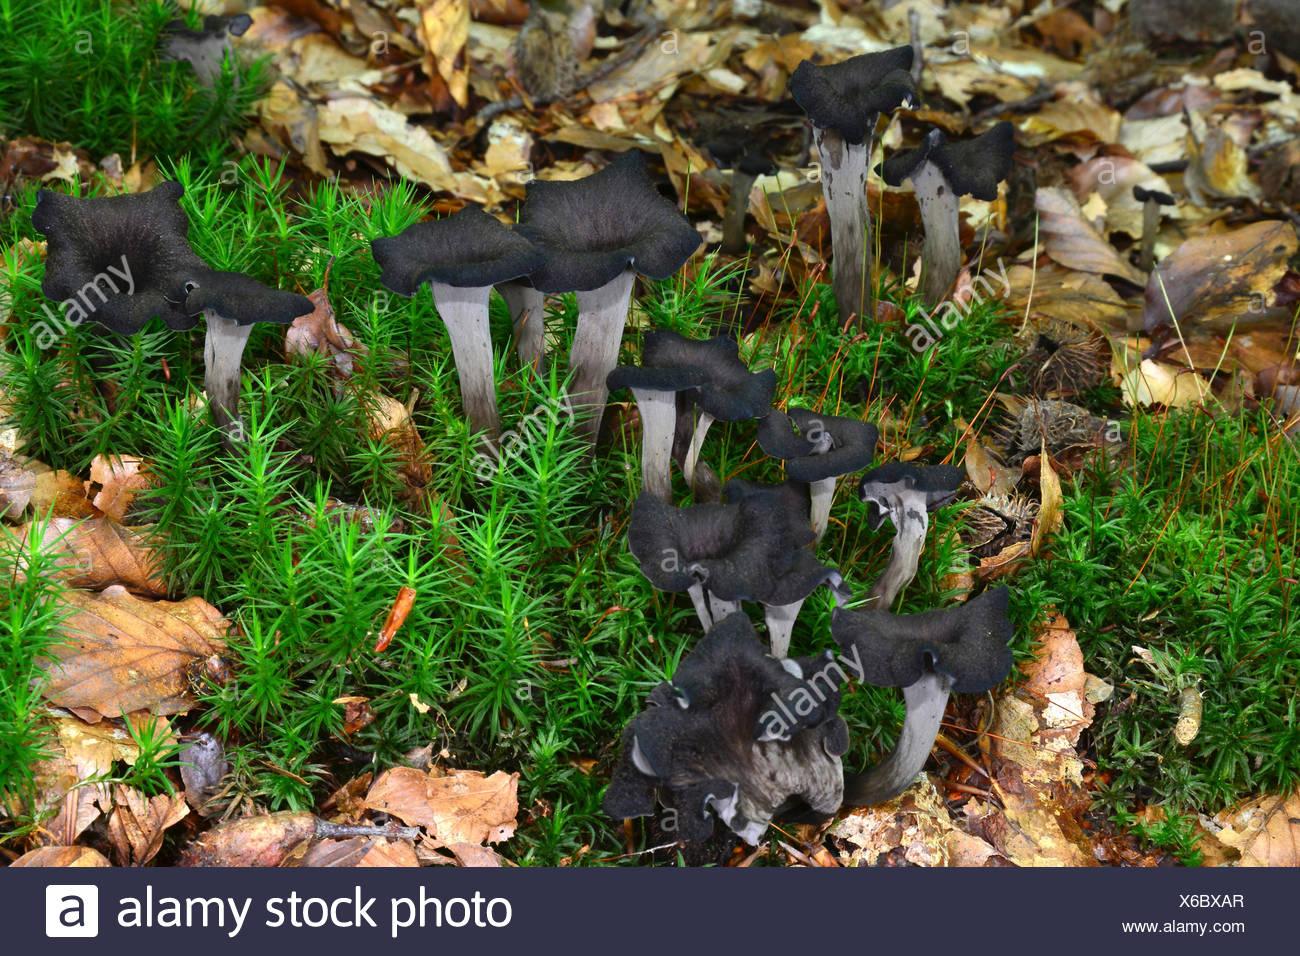 Horn of Plenty (Craterellus cornucopioides), fruiting bodies on the forest floor. - Stock Image